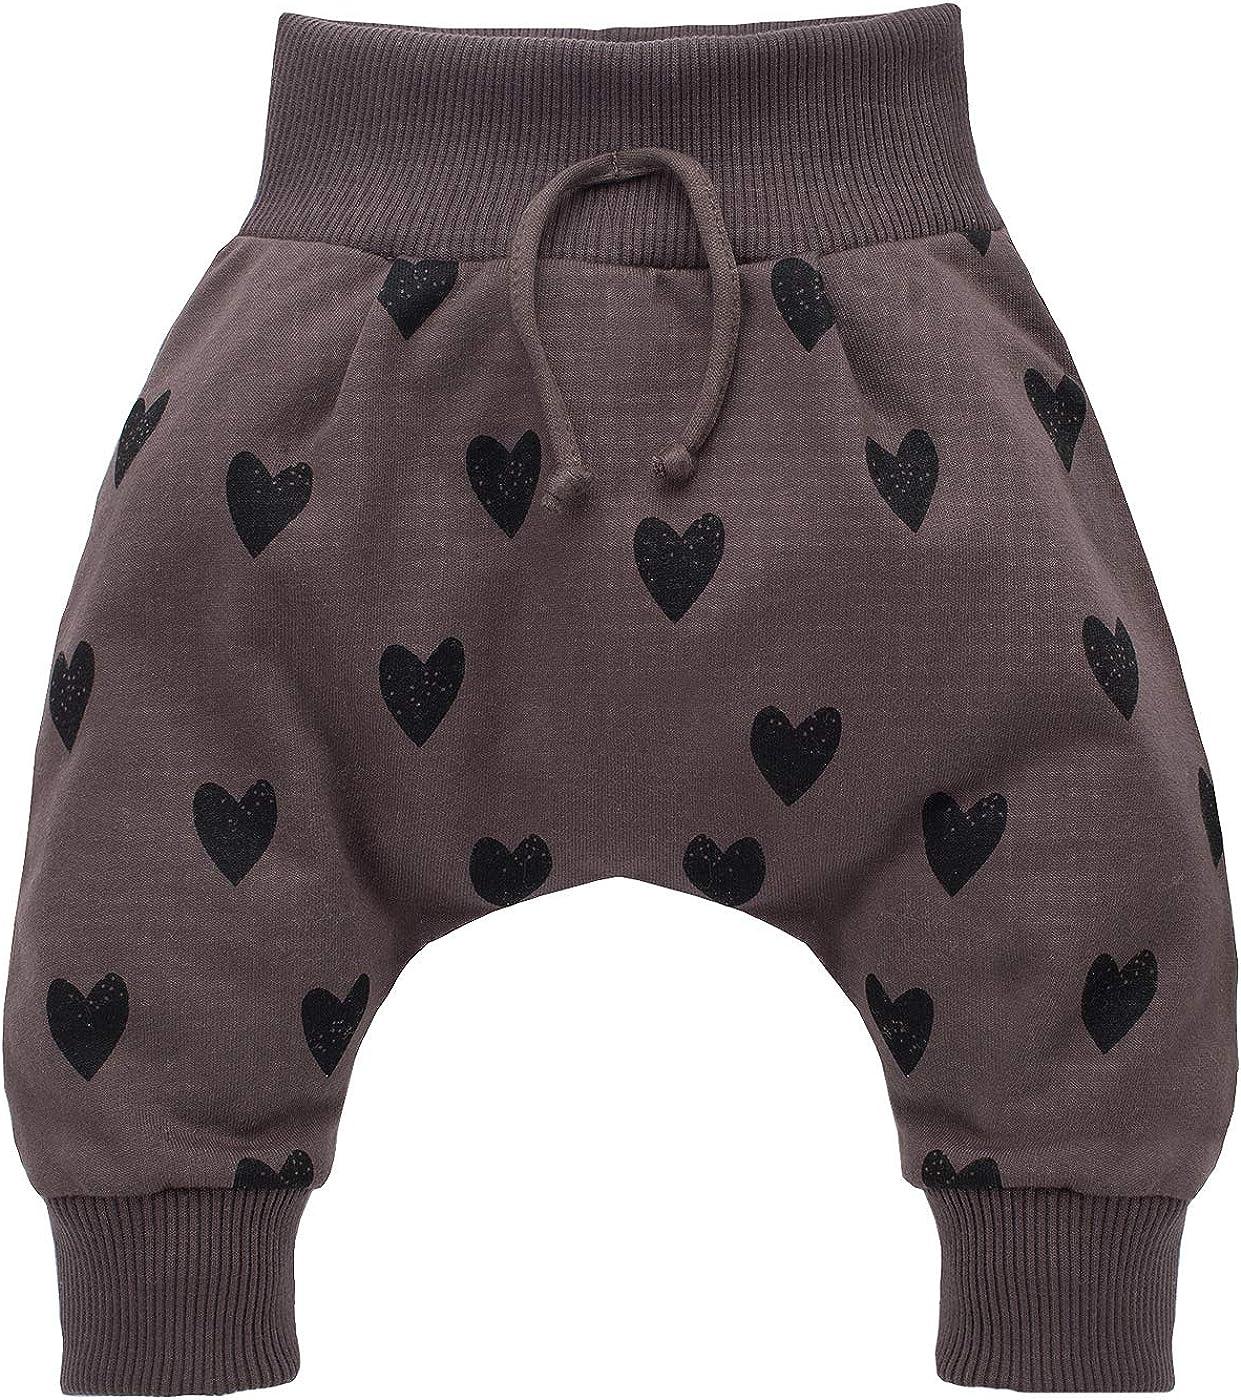 Little Bird Pantaloni Bimba Bambina Baby Marrone con Cuore 100/% Cotone Harem Pantaloni Baggy 62-104 cm Pinokio